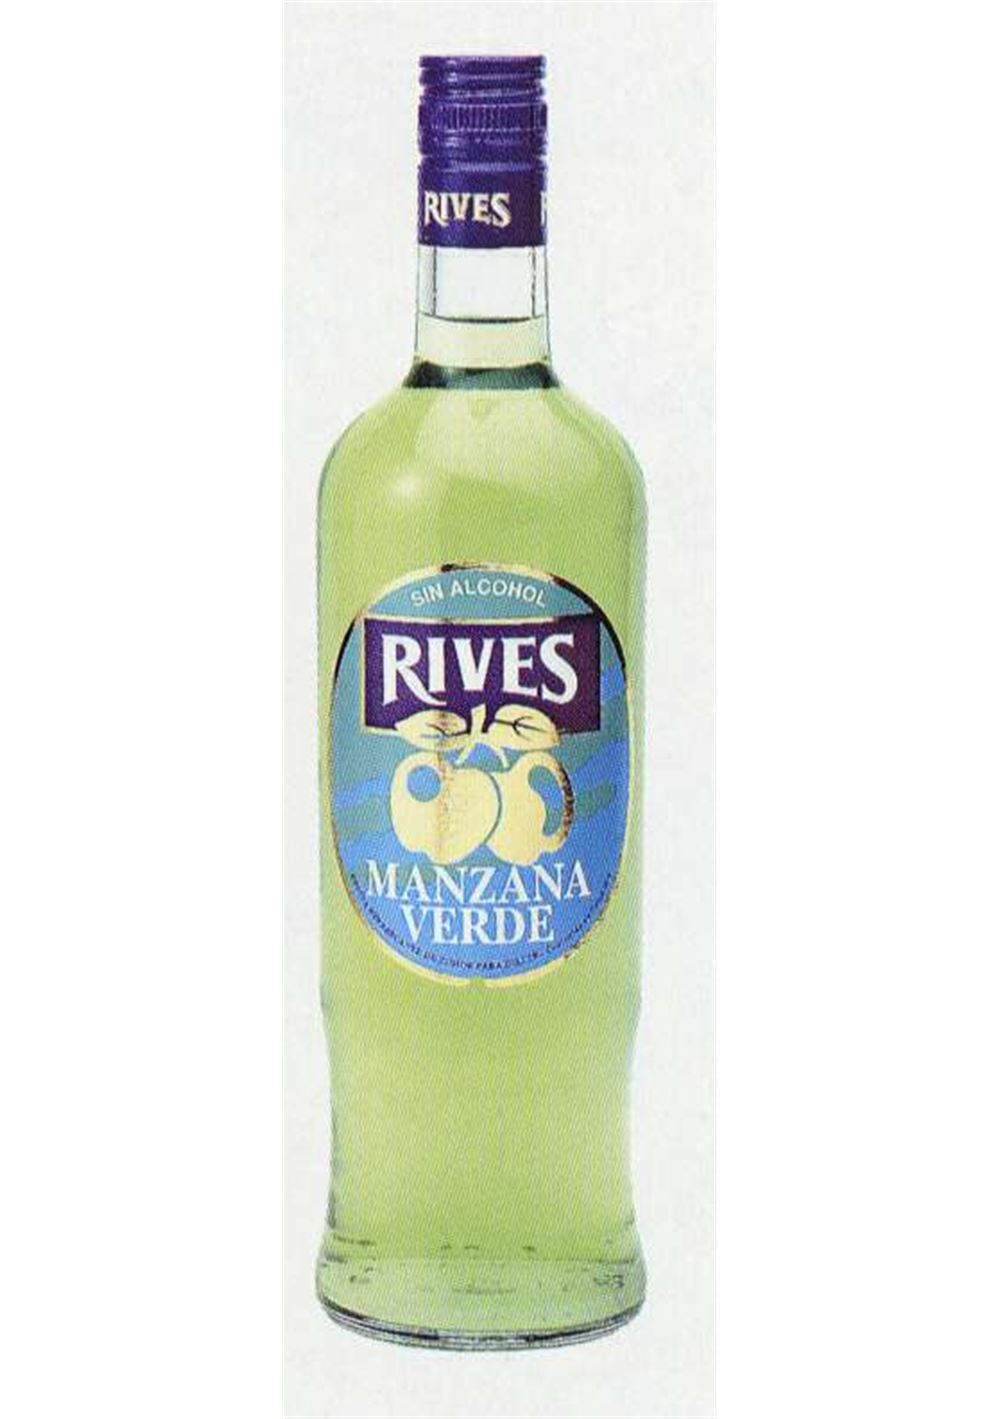 RIVES MANZANA SALCOHOL